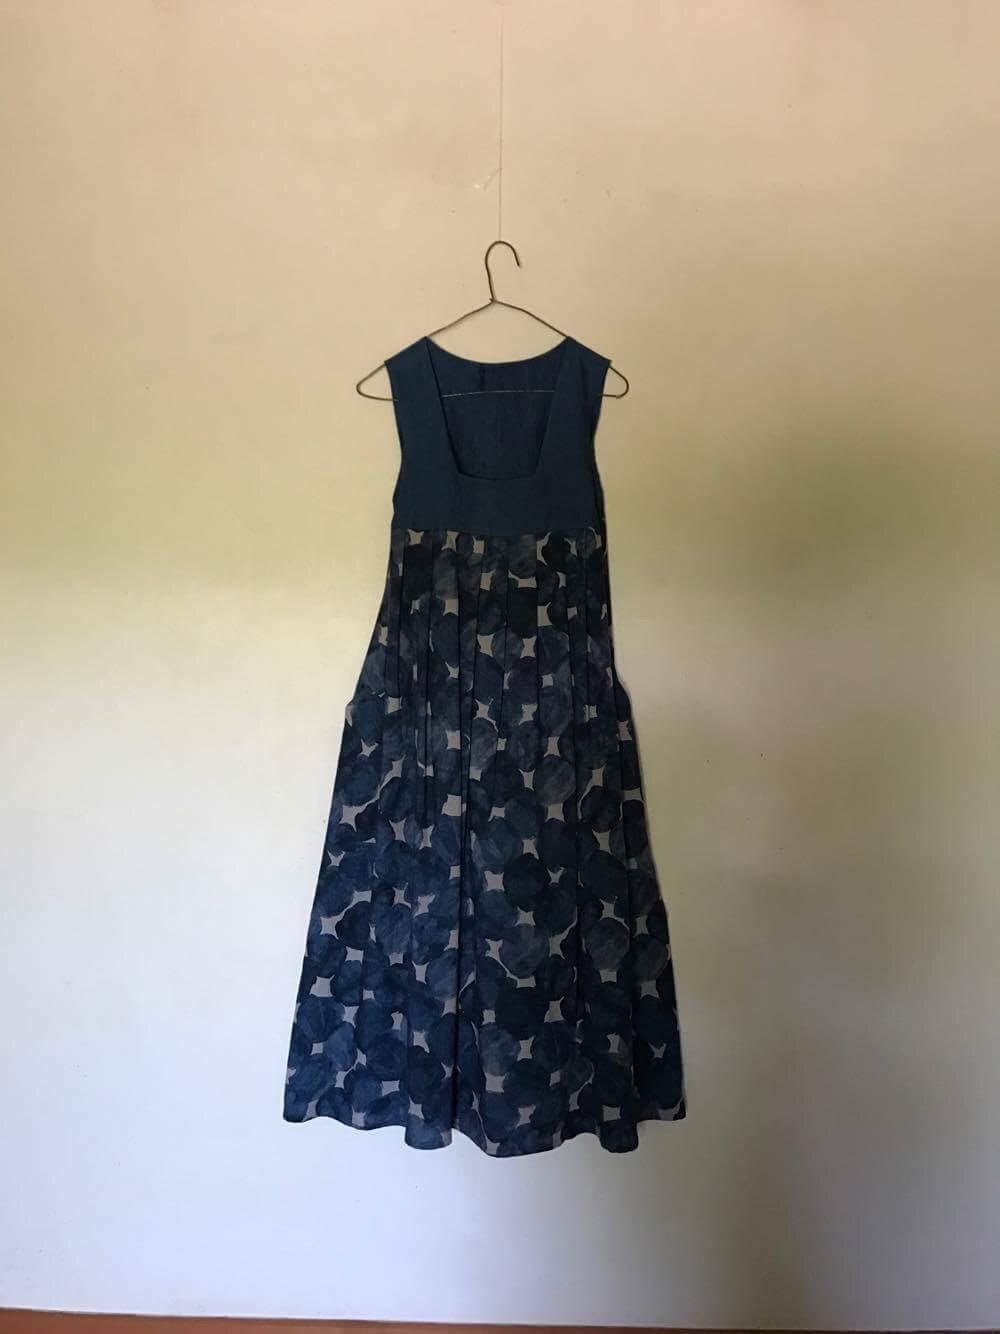 三橋妙子 夏の服展_c0256701_12002649.jpg